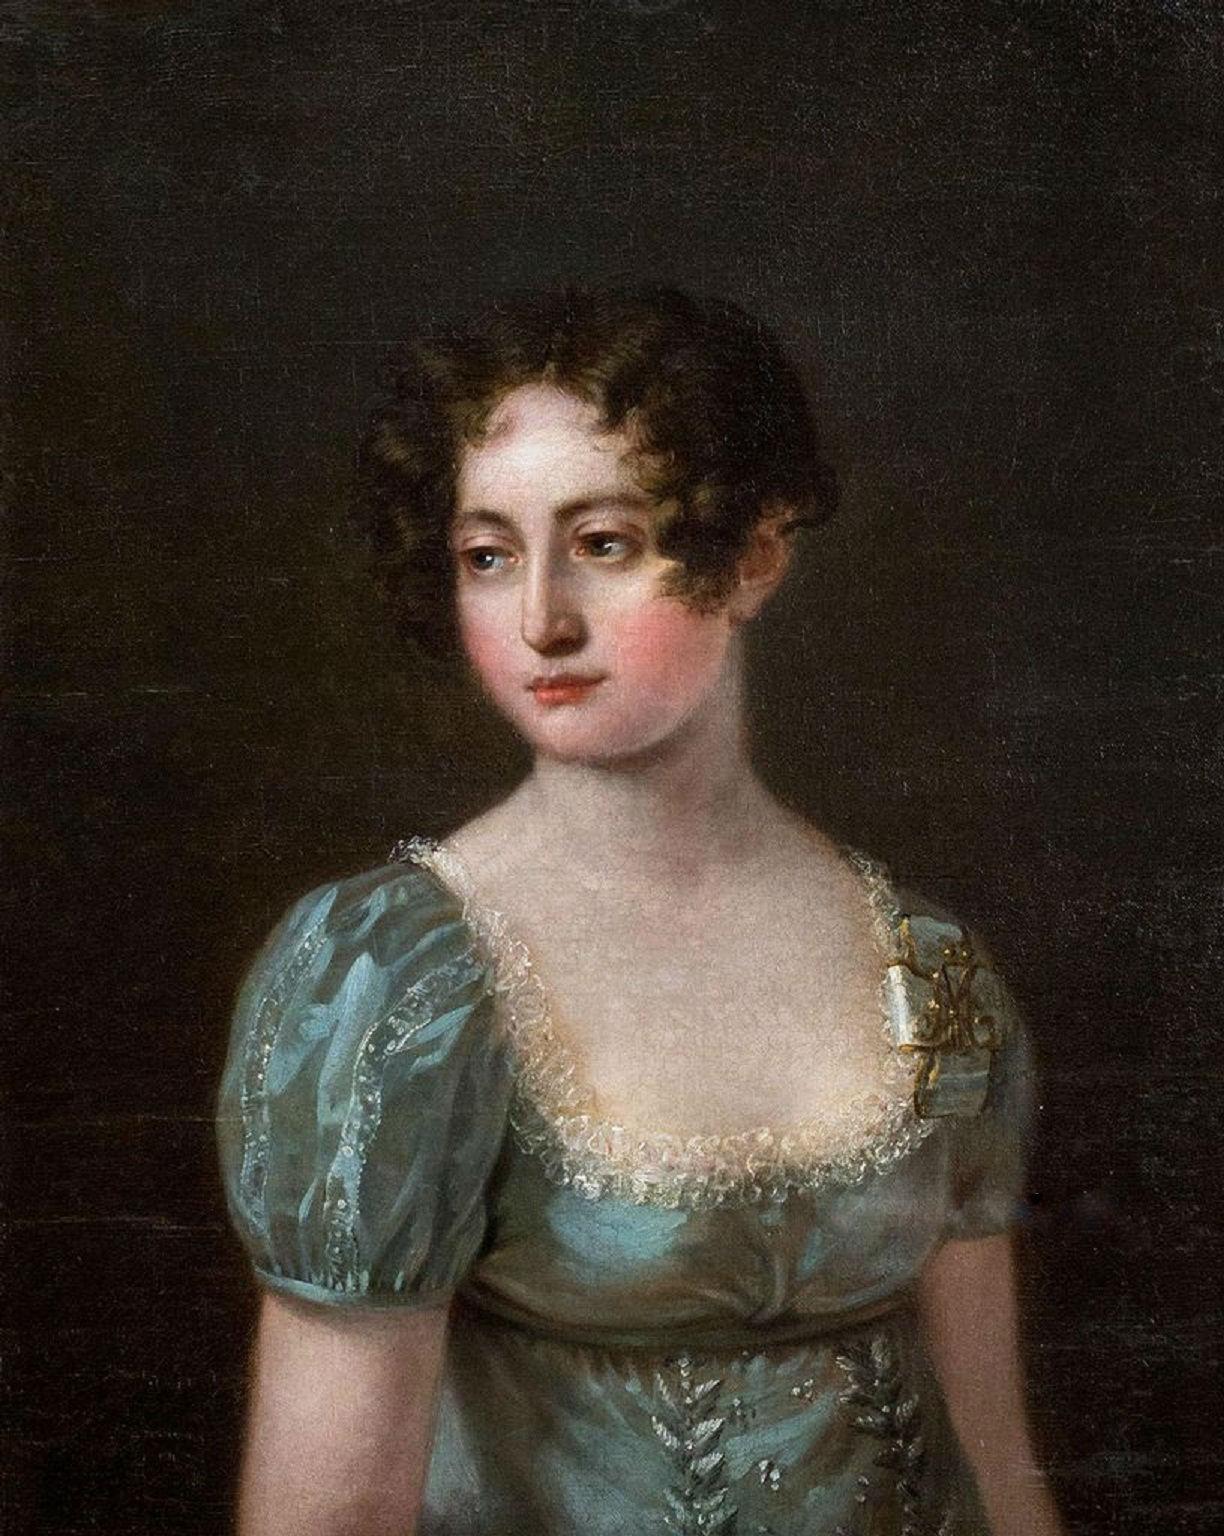 https://upload.wikimedia.org/wikipedia/commons/a/aa/M.Shipova.jpg